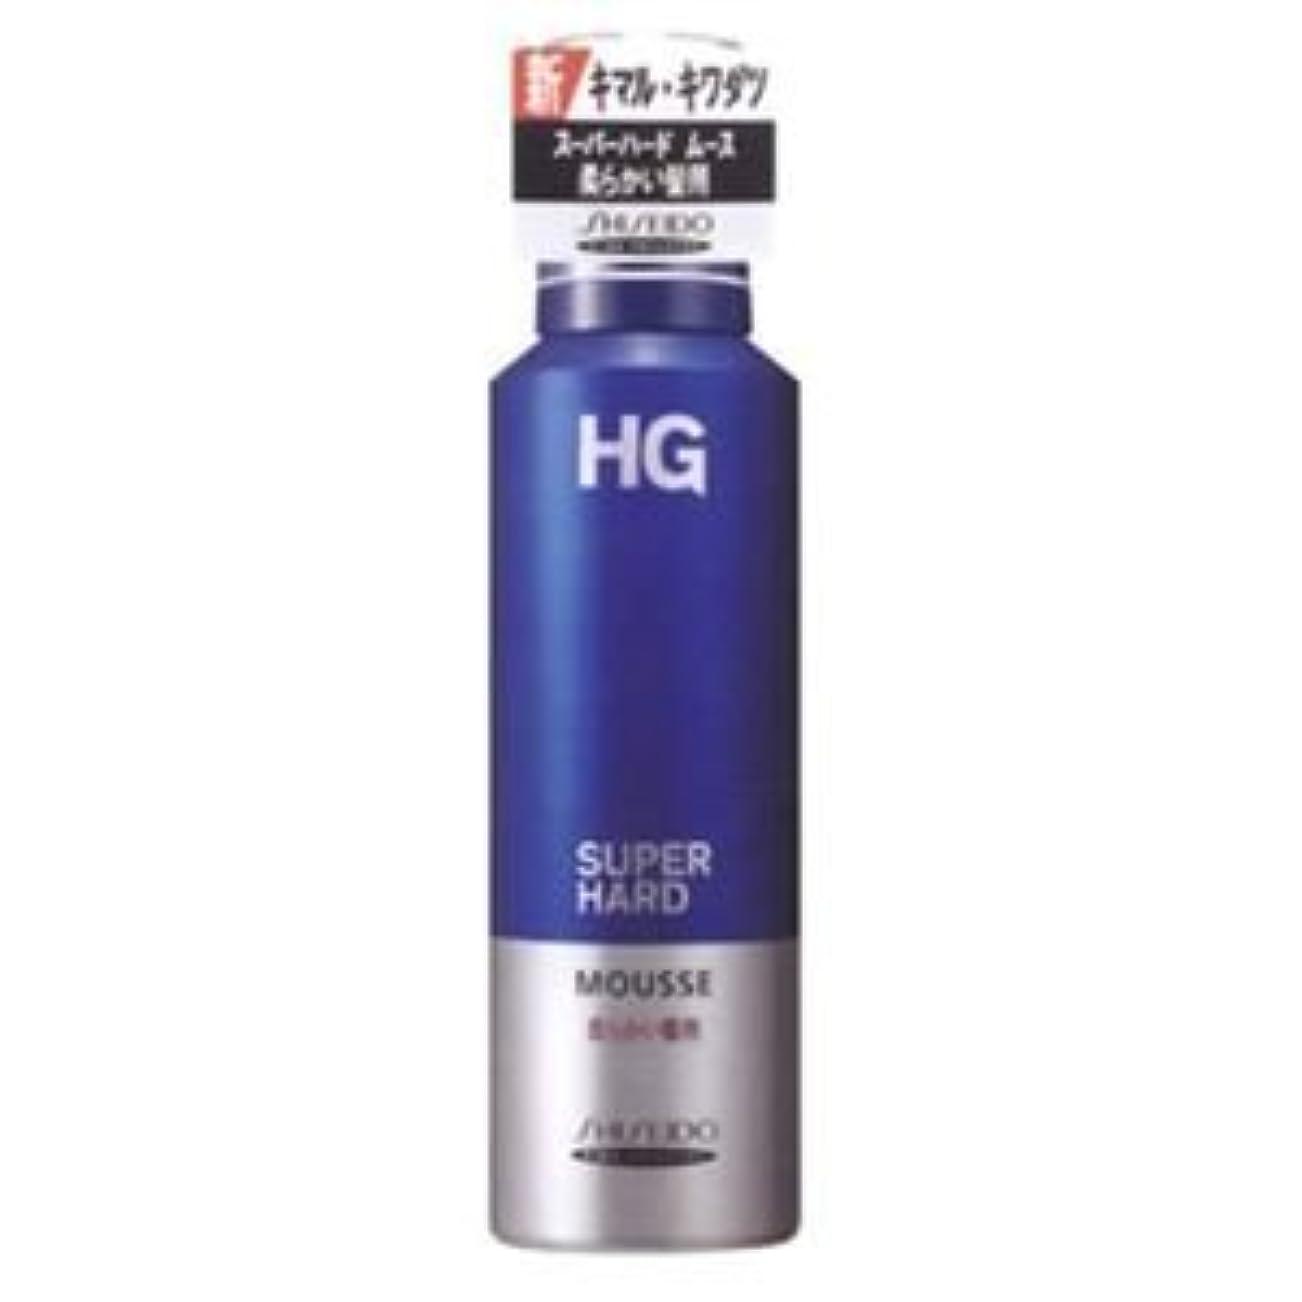 HG スーパーハードムース 柔らかい髪用 5セット